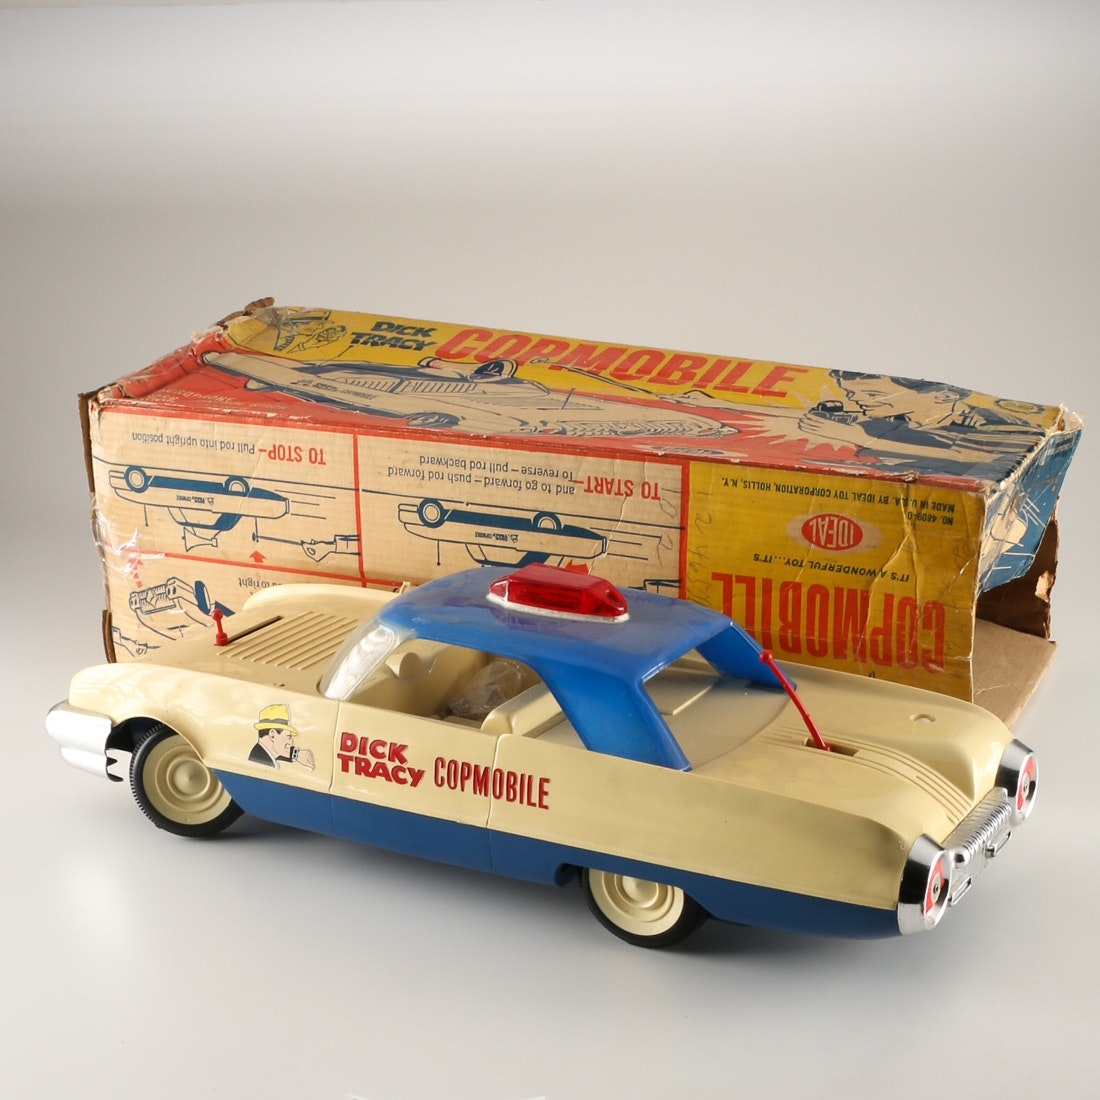 Dick Tracy Copmobile Plastic Police Car : EBTH